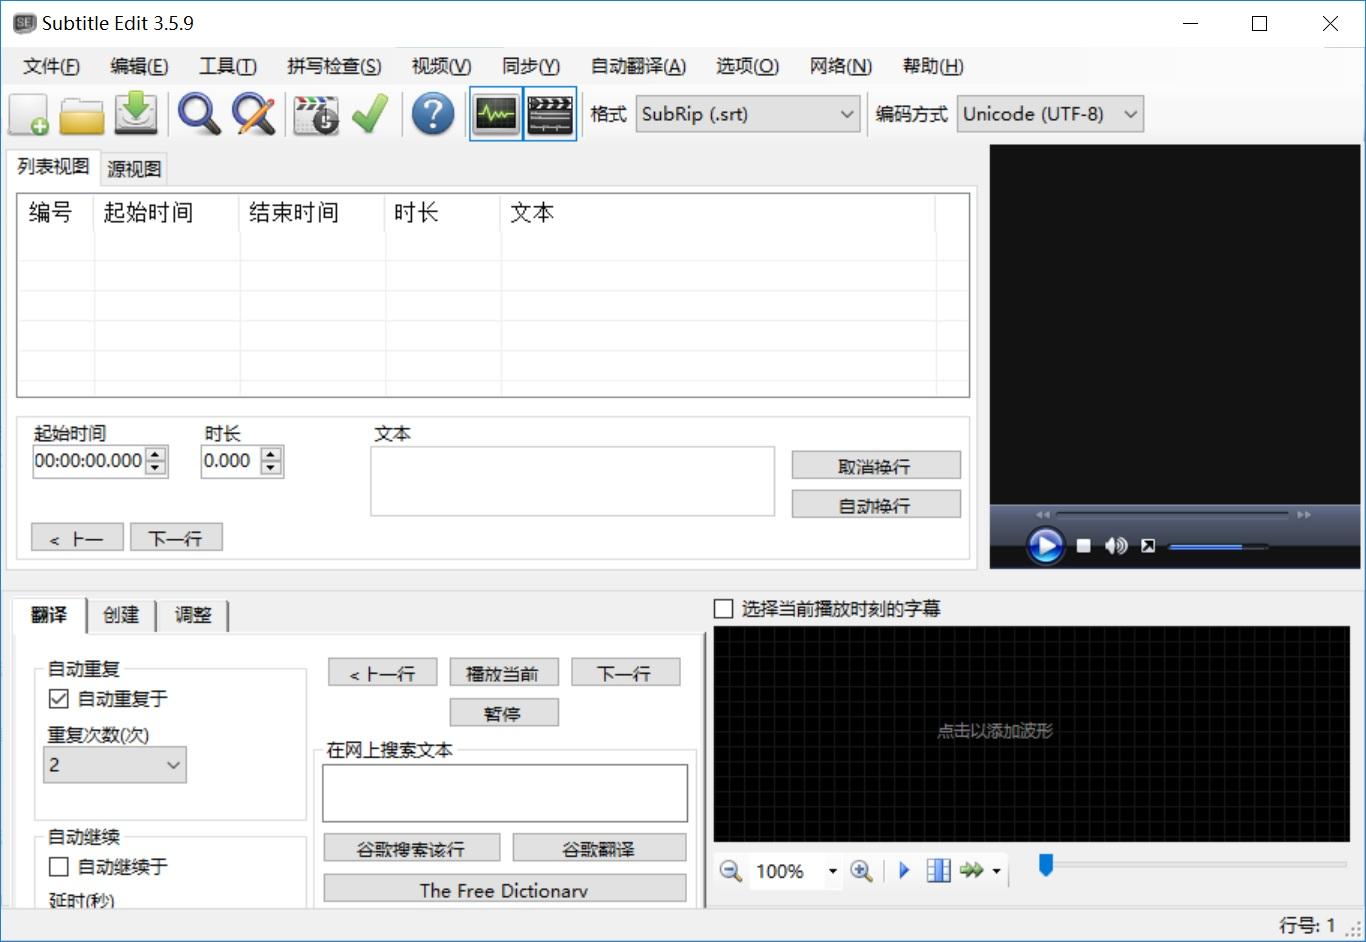 Subtitle Edit 破解版|文本字幕编辑软件 Subtitle Edit 3.5.9 绿色破解版(免激活码)